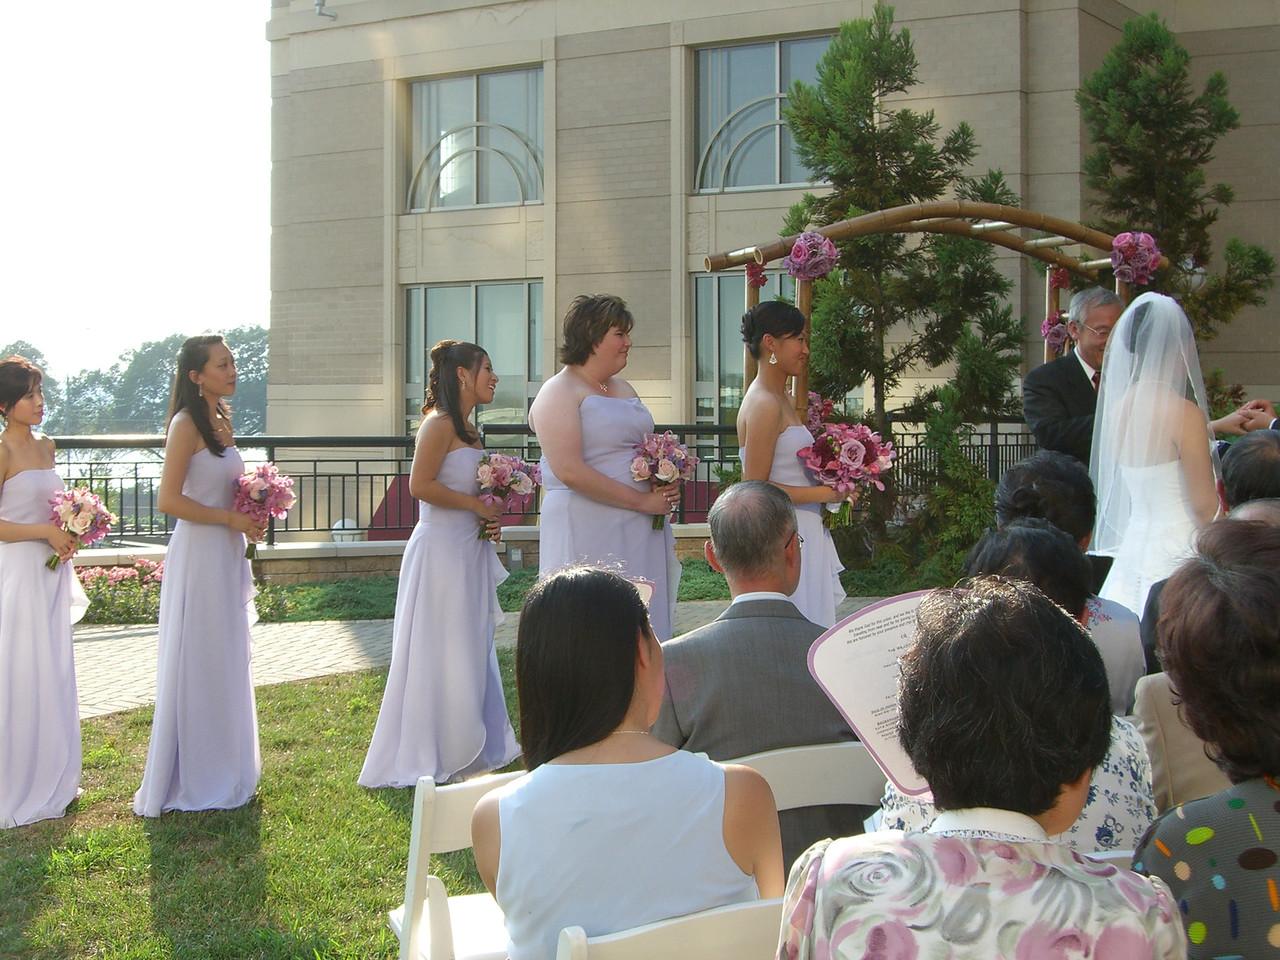 Ceremony - Bride's party 2